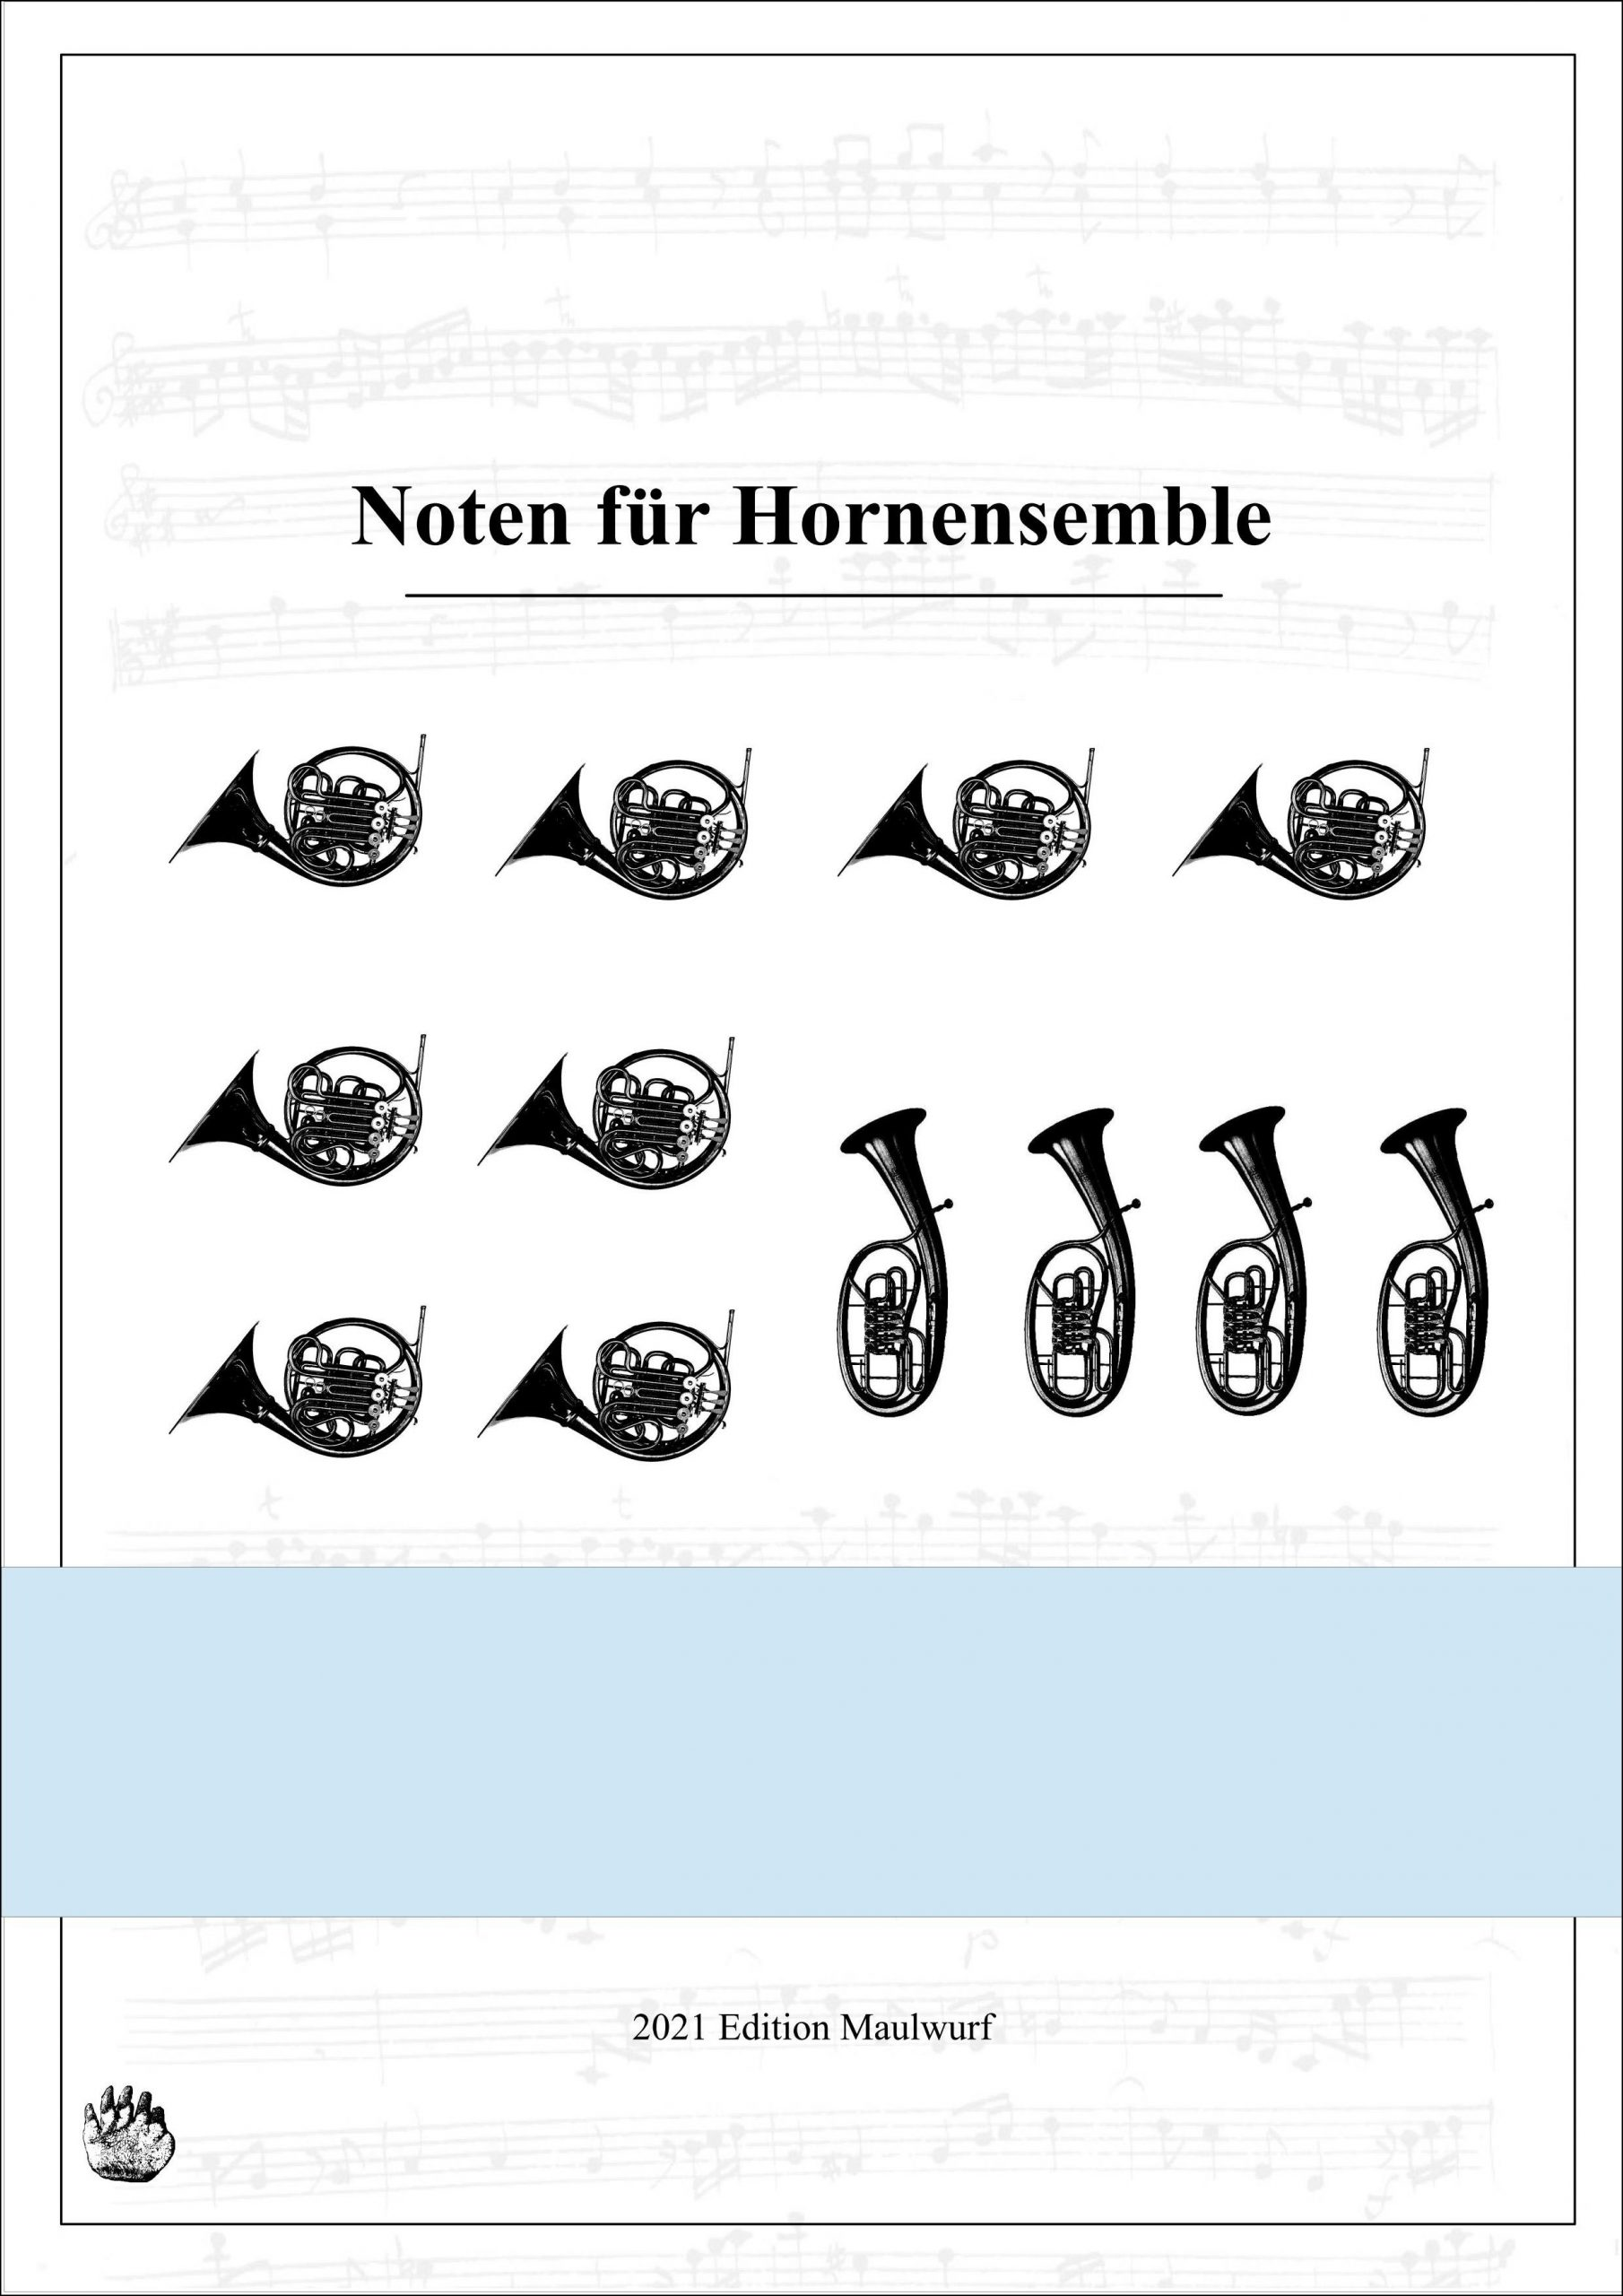 Hornensemble